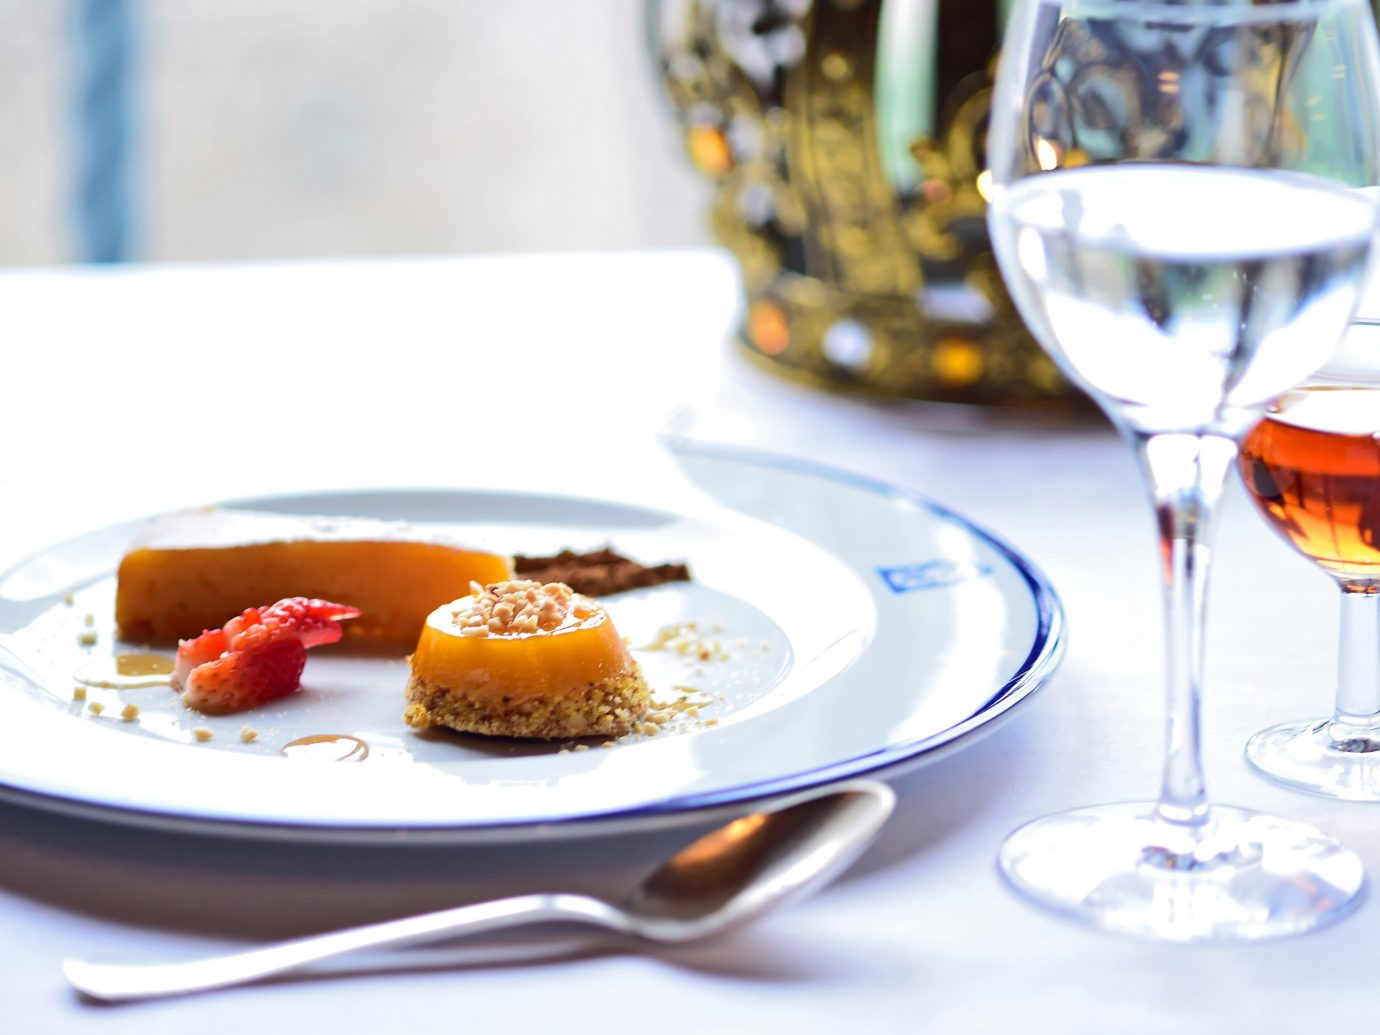 Hotels table plate wine food indoor meal dish produce dessert breakfast fruit